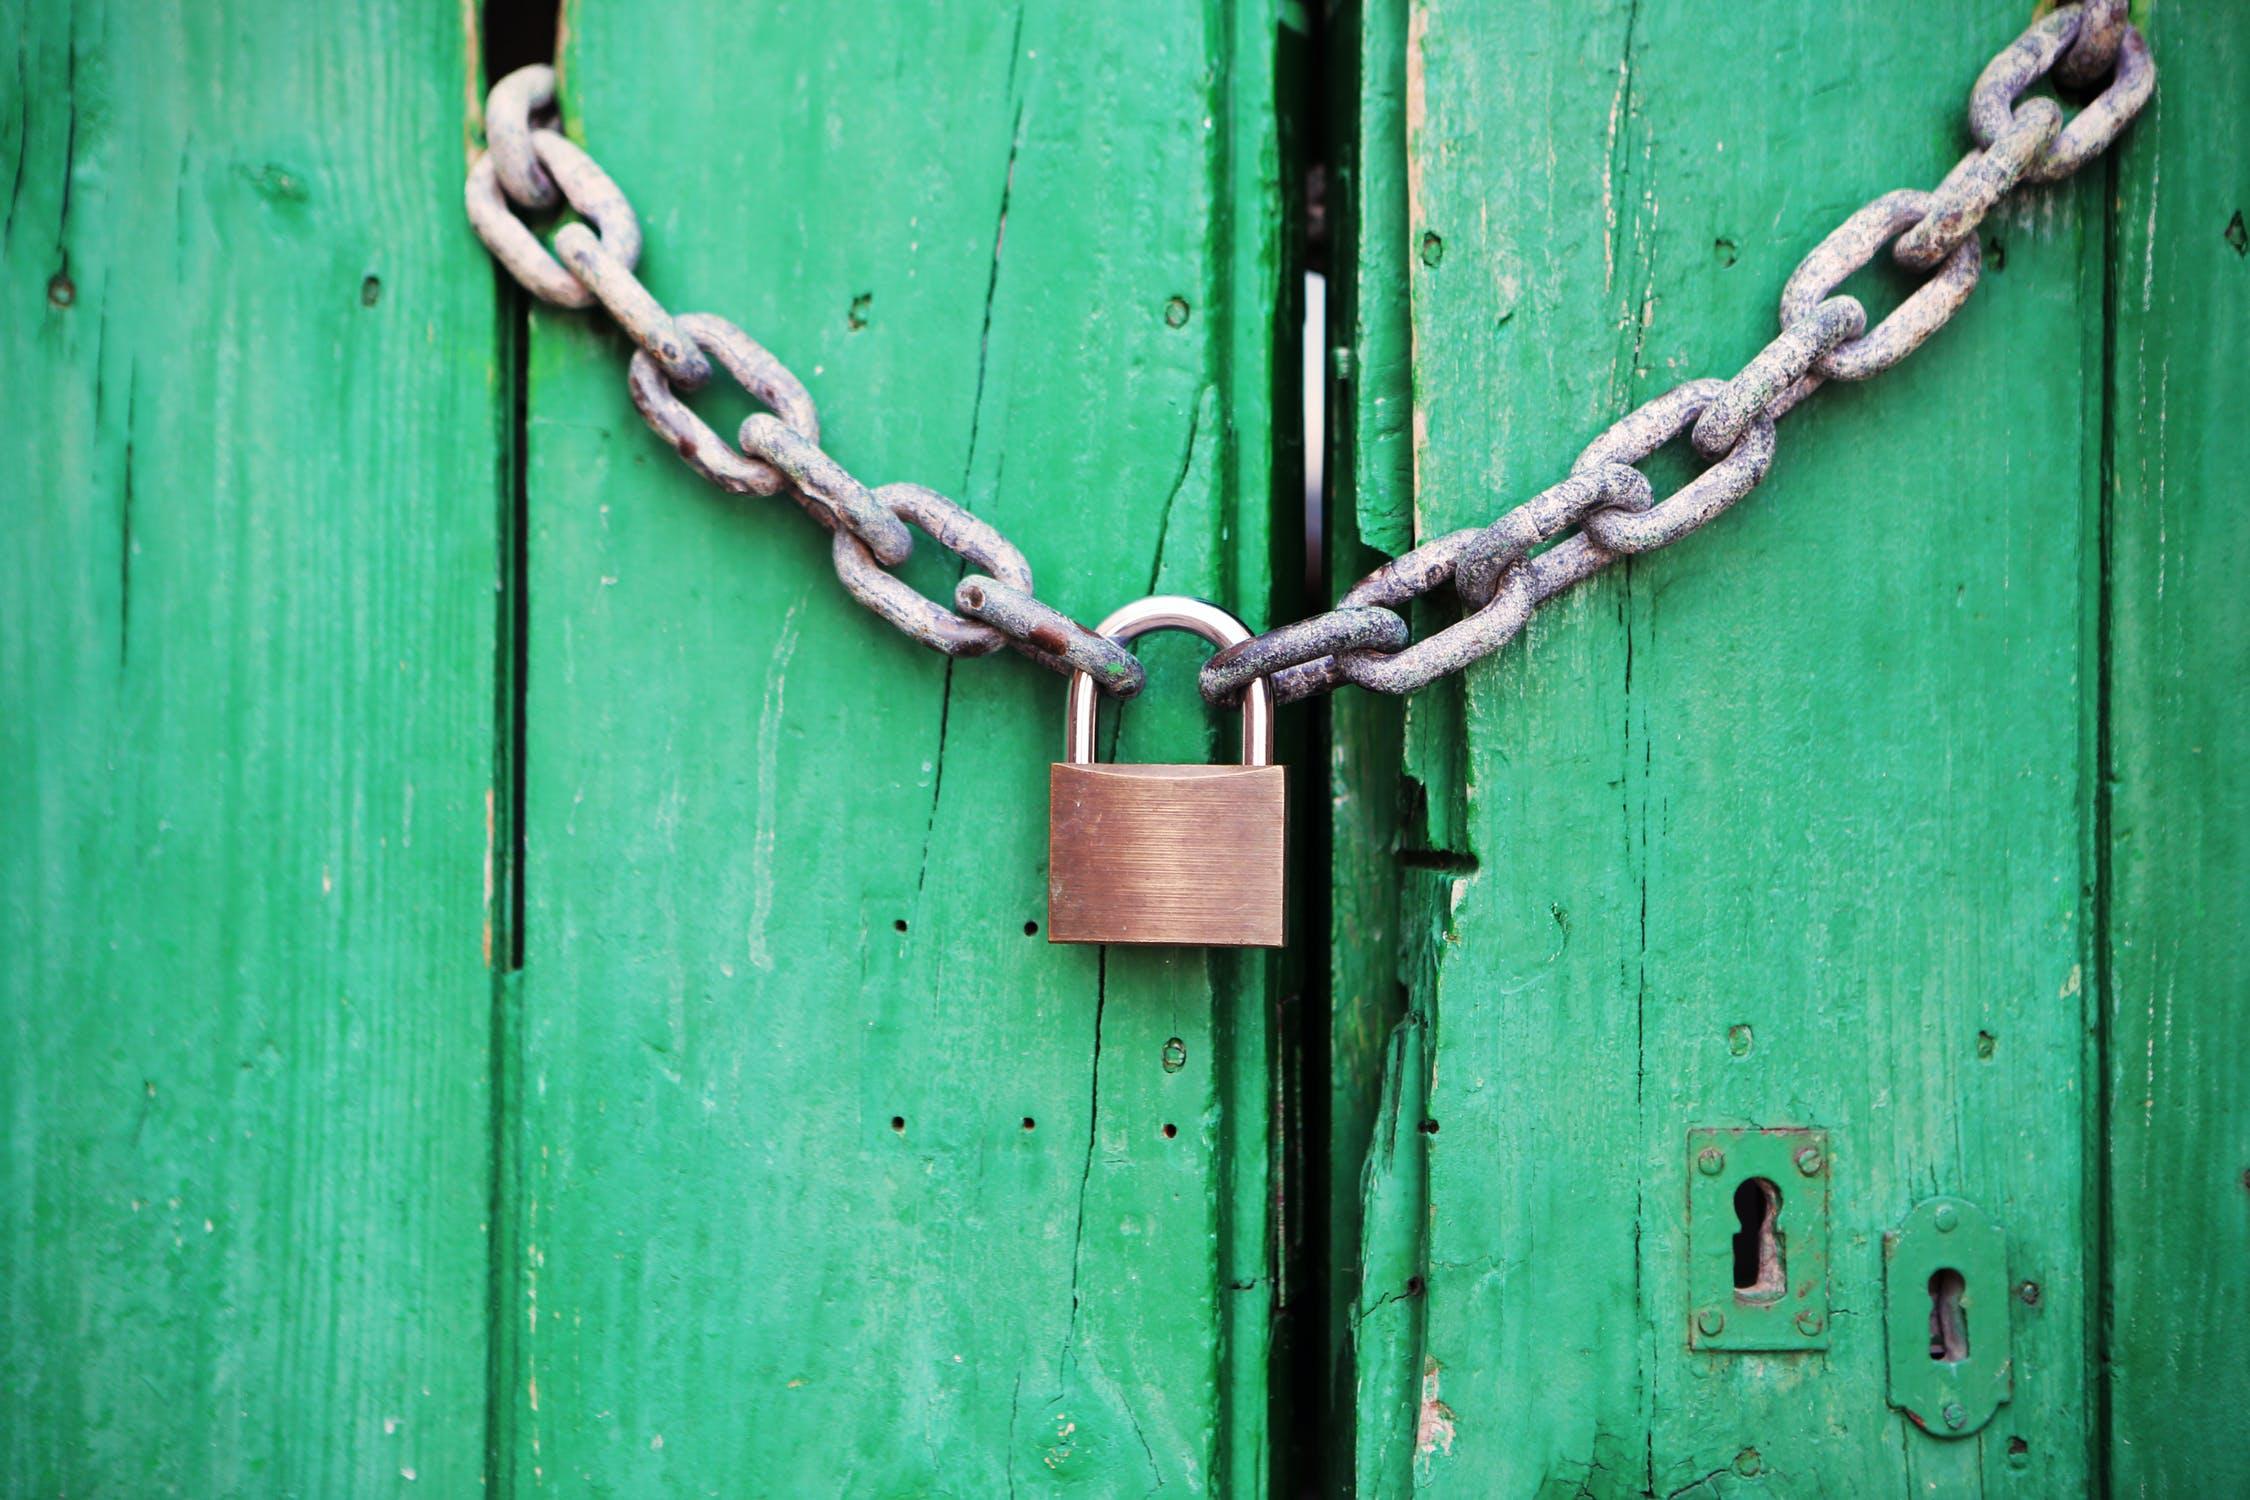 https://serwer1604278.home.pl/przedsiebiorca.eurekarestrukturyzacje.pl/wp-content/uploads/2020/07/door-green-closed-lock.jpg